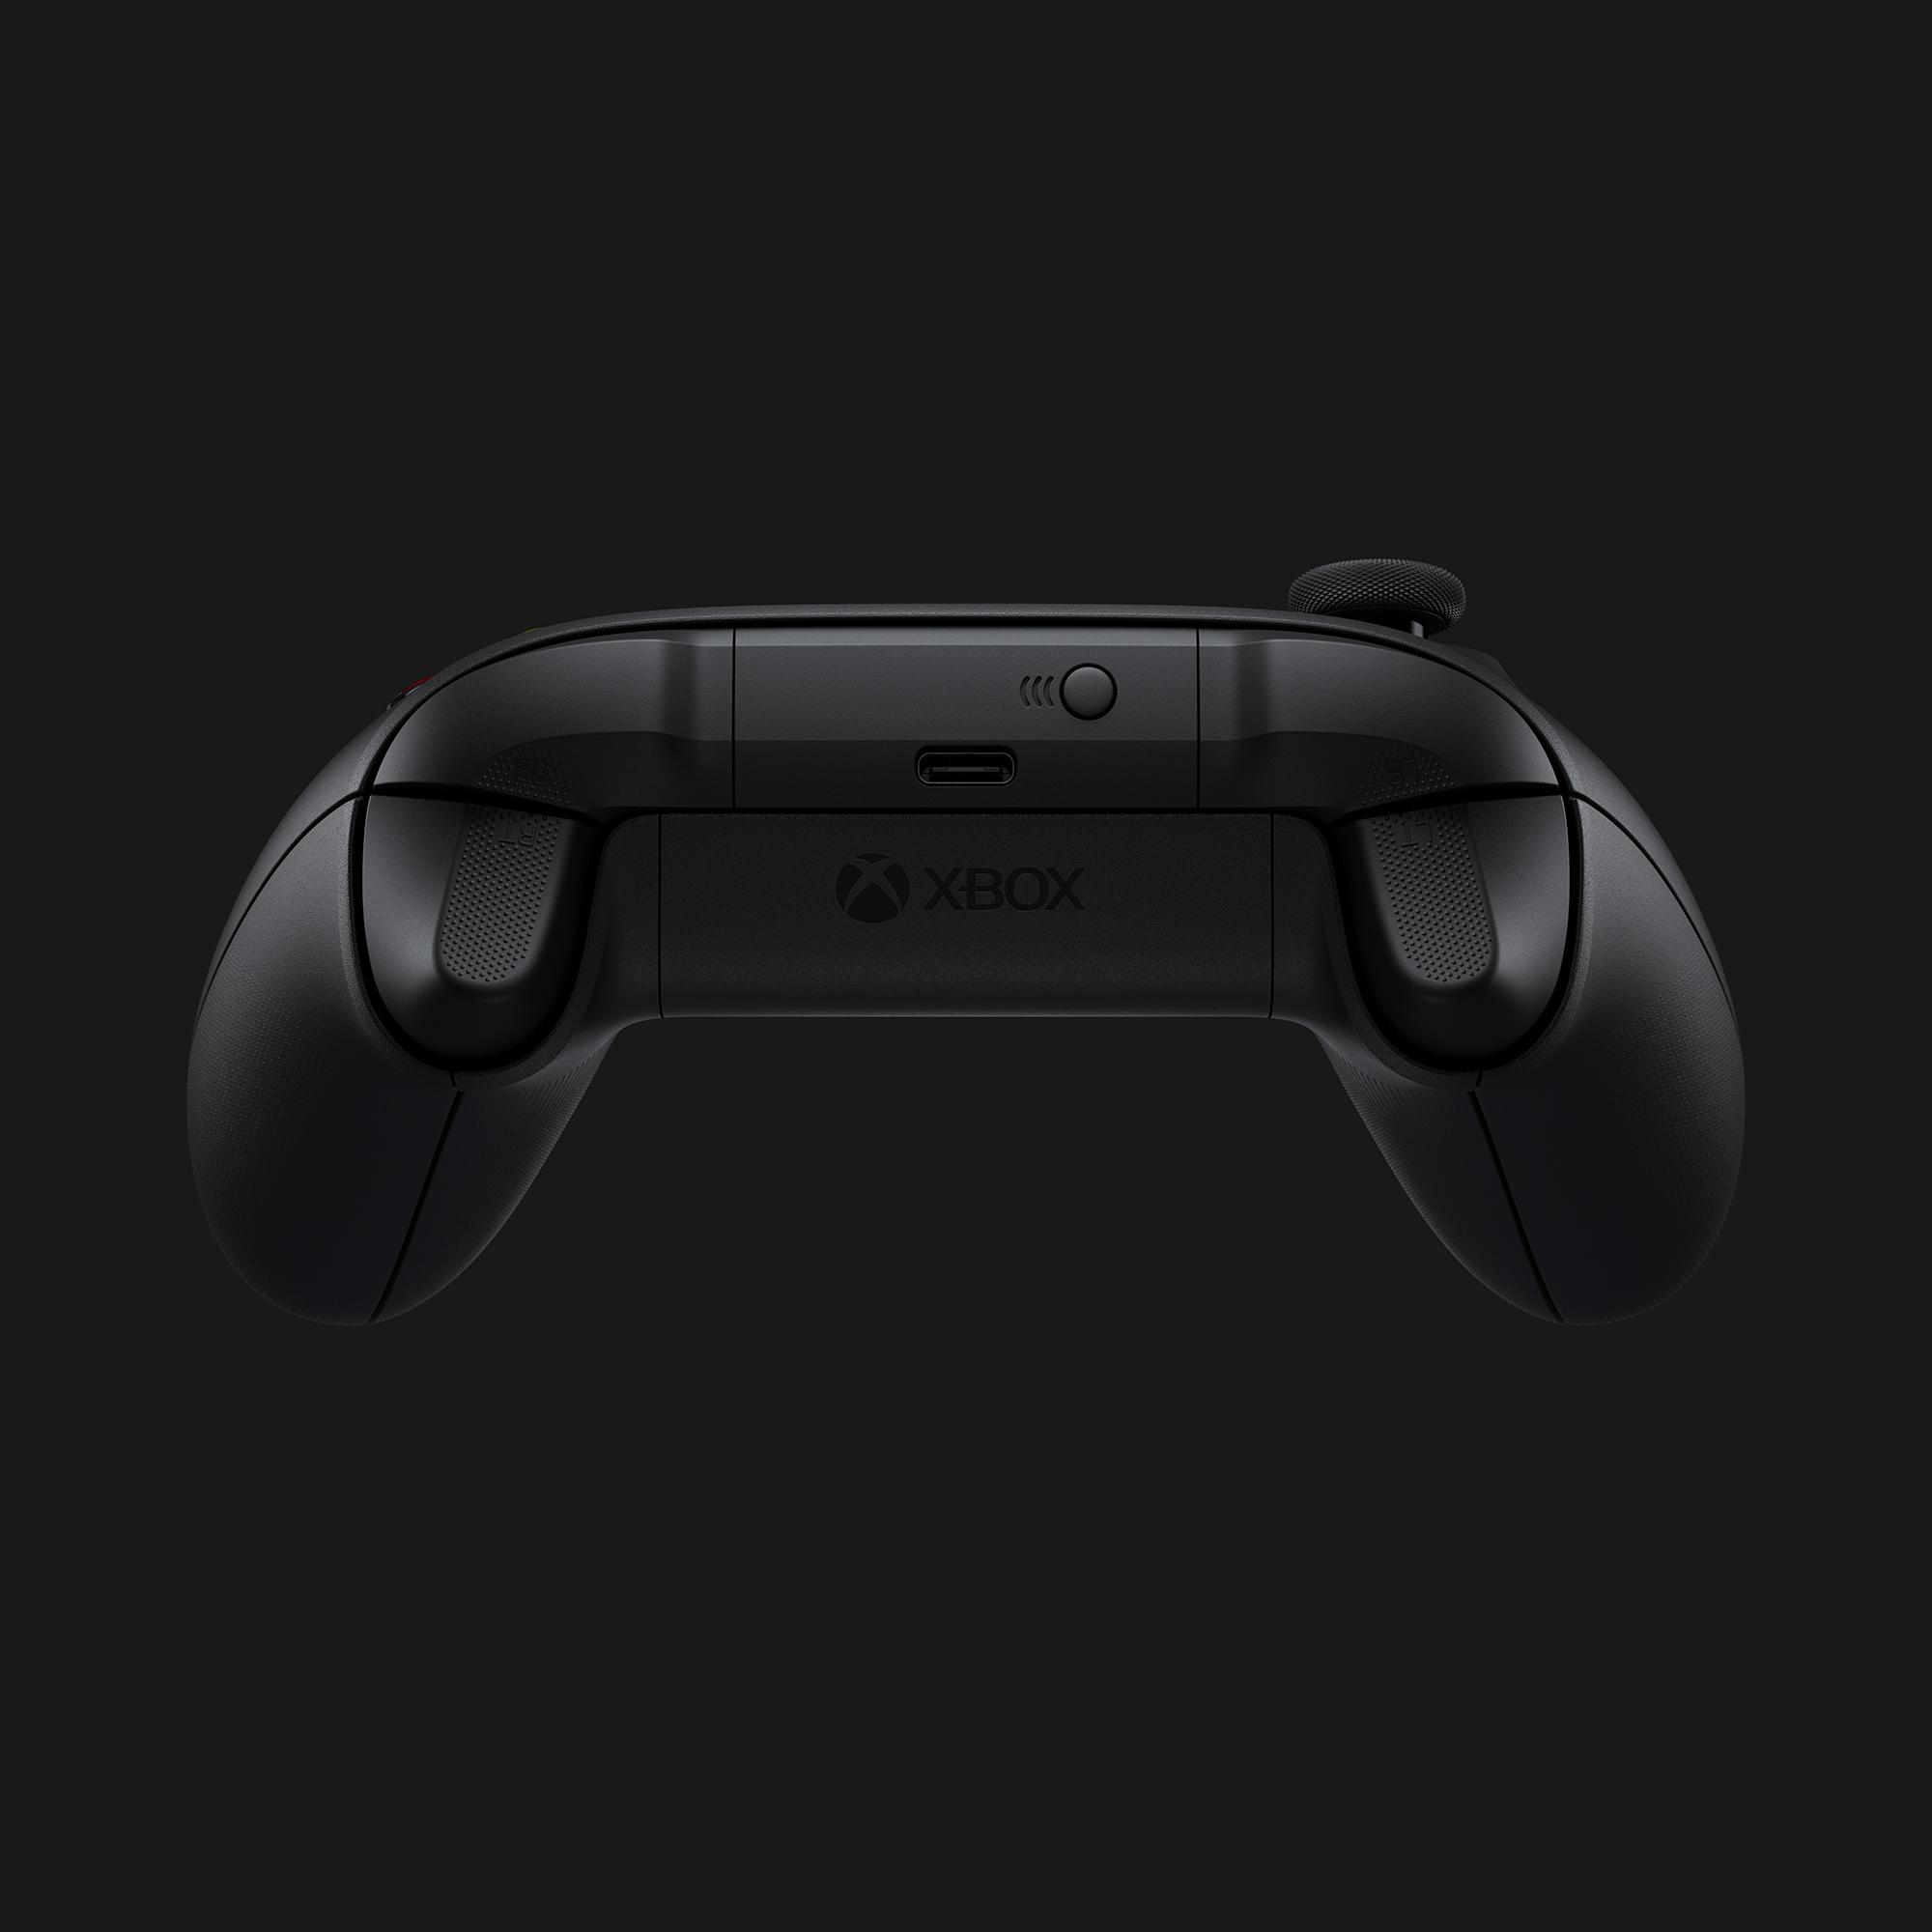 xbox-series-x-gamepad-2